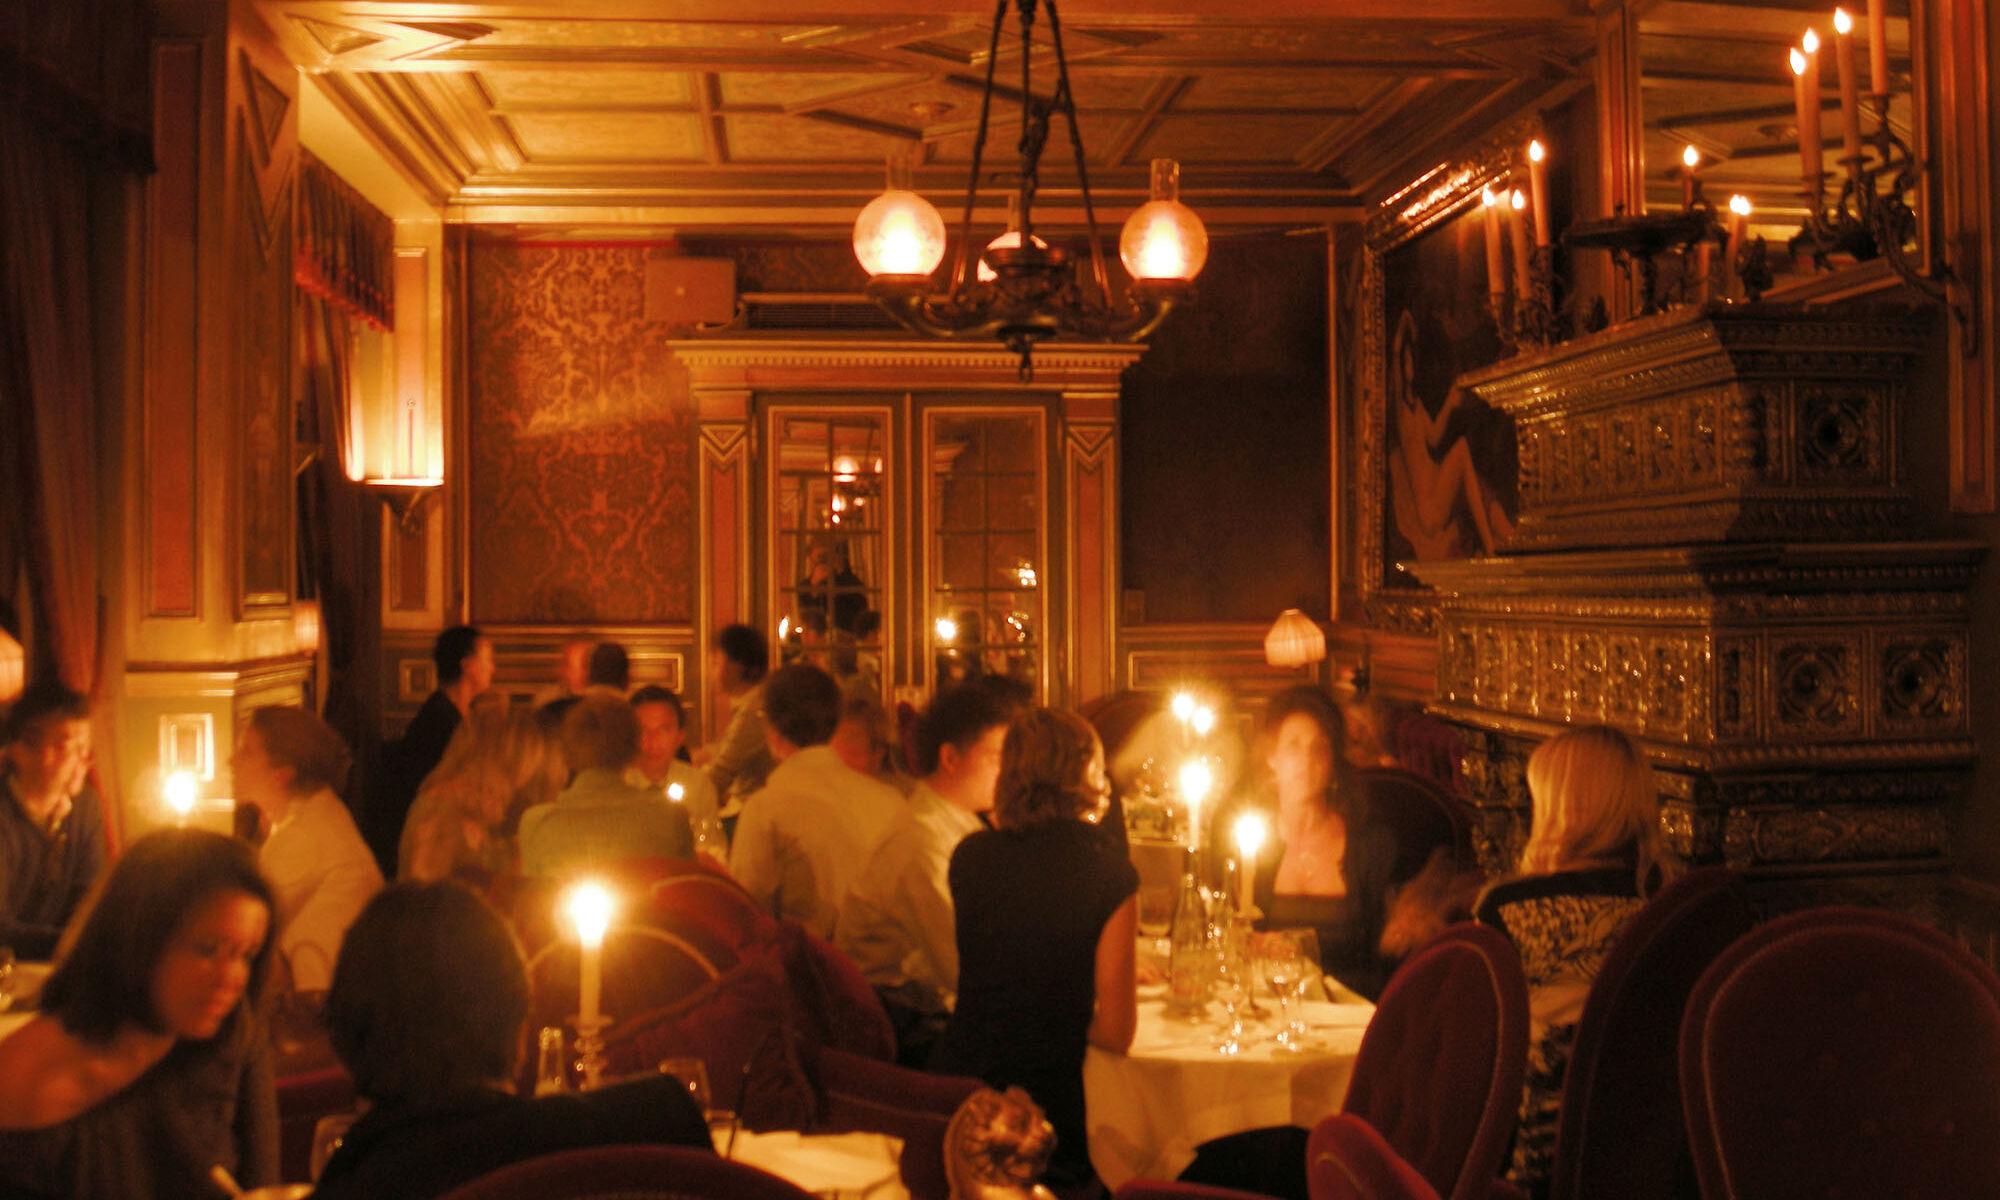 11_06_13_198_restaurant_h_tel_costes_Arno_Nollen.jpeg